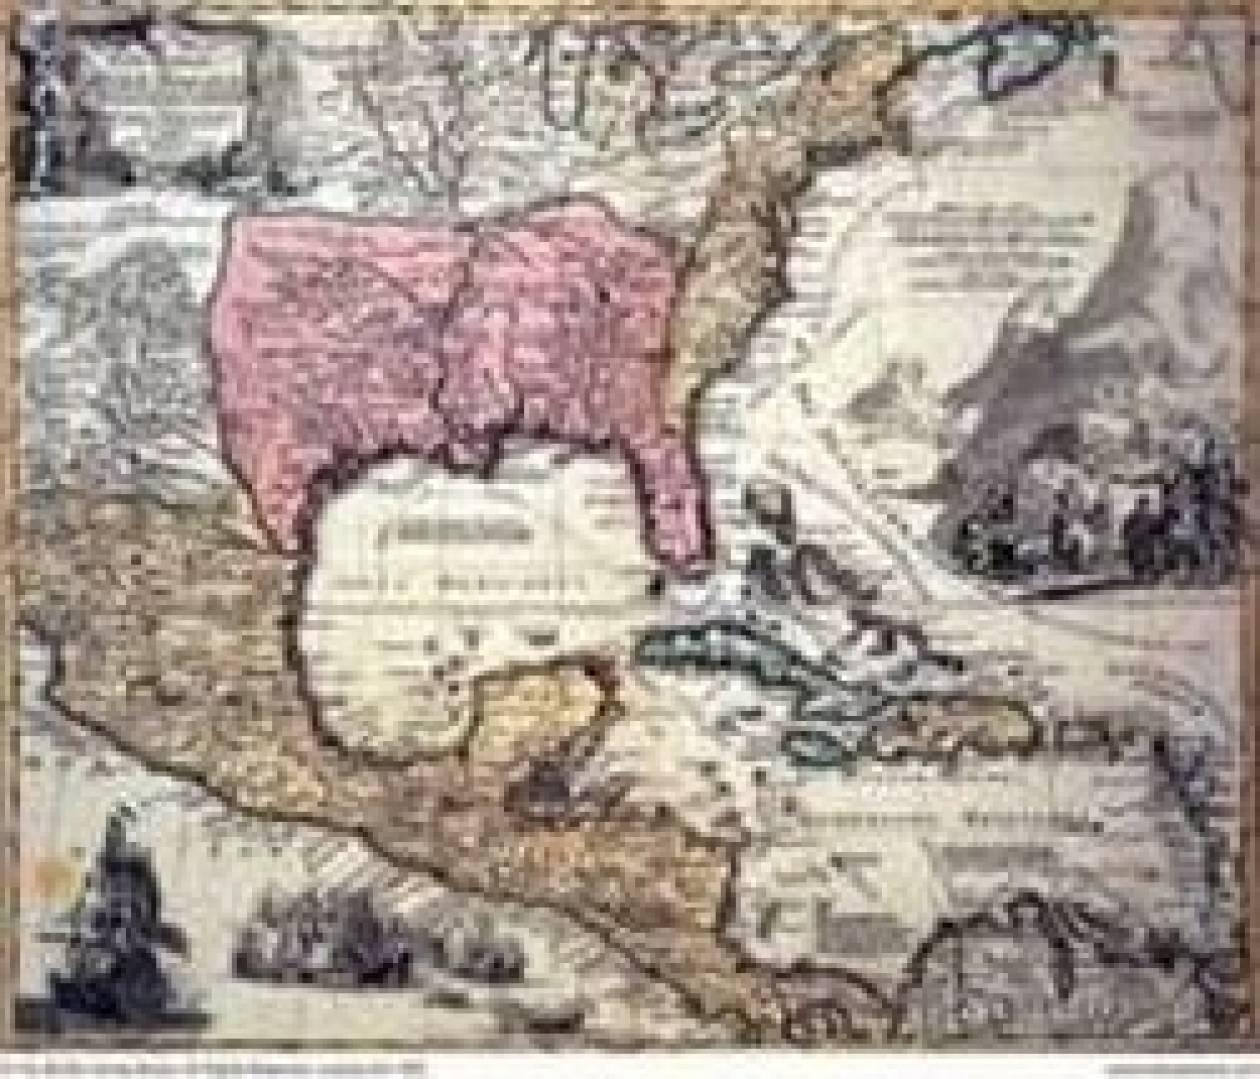 O Πλούταρχος και οι Βυζαντινοί γνώριζαν την Αμερική!